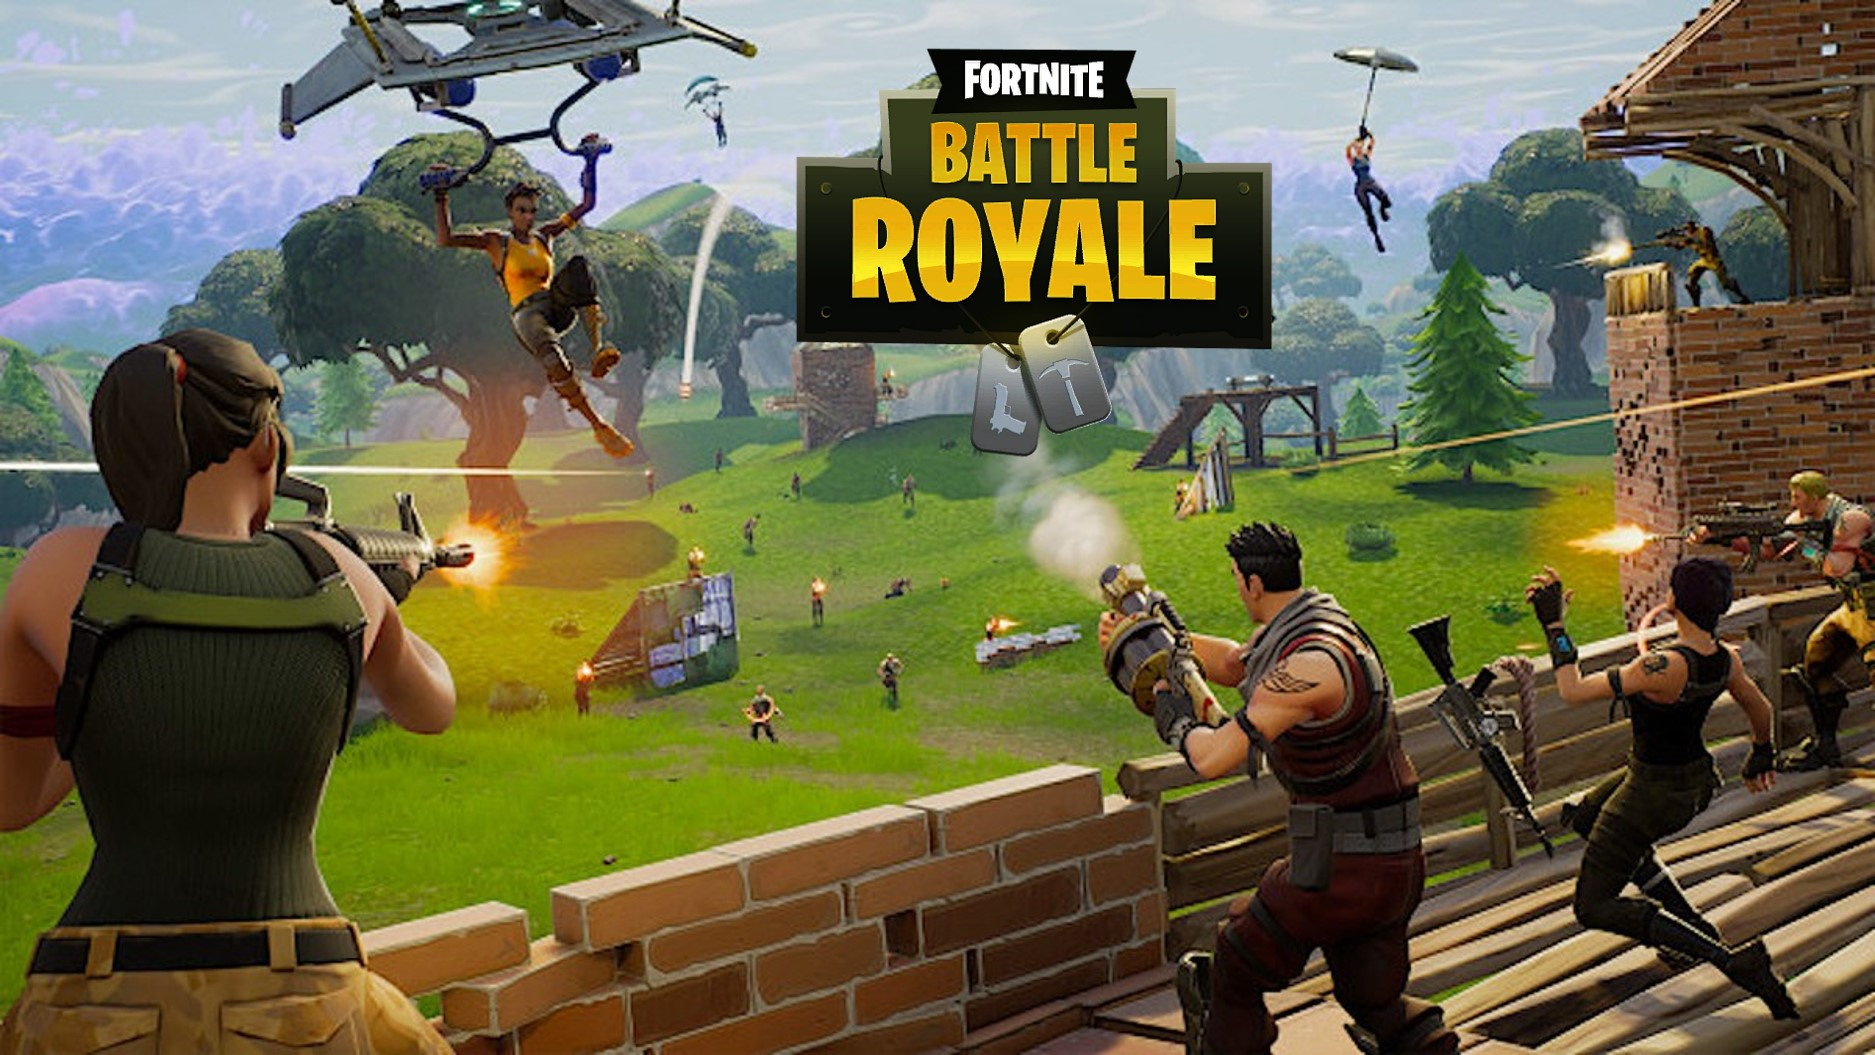 Fortnite Battle Royale Seht Hier Alle Waffen Im Spiel